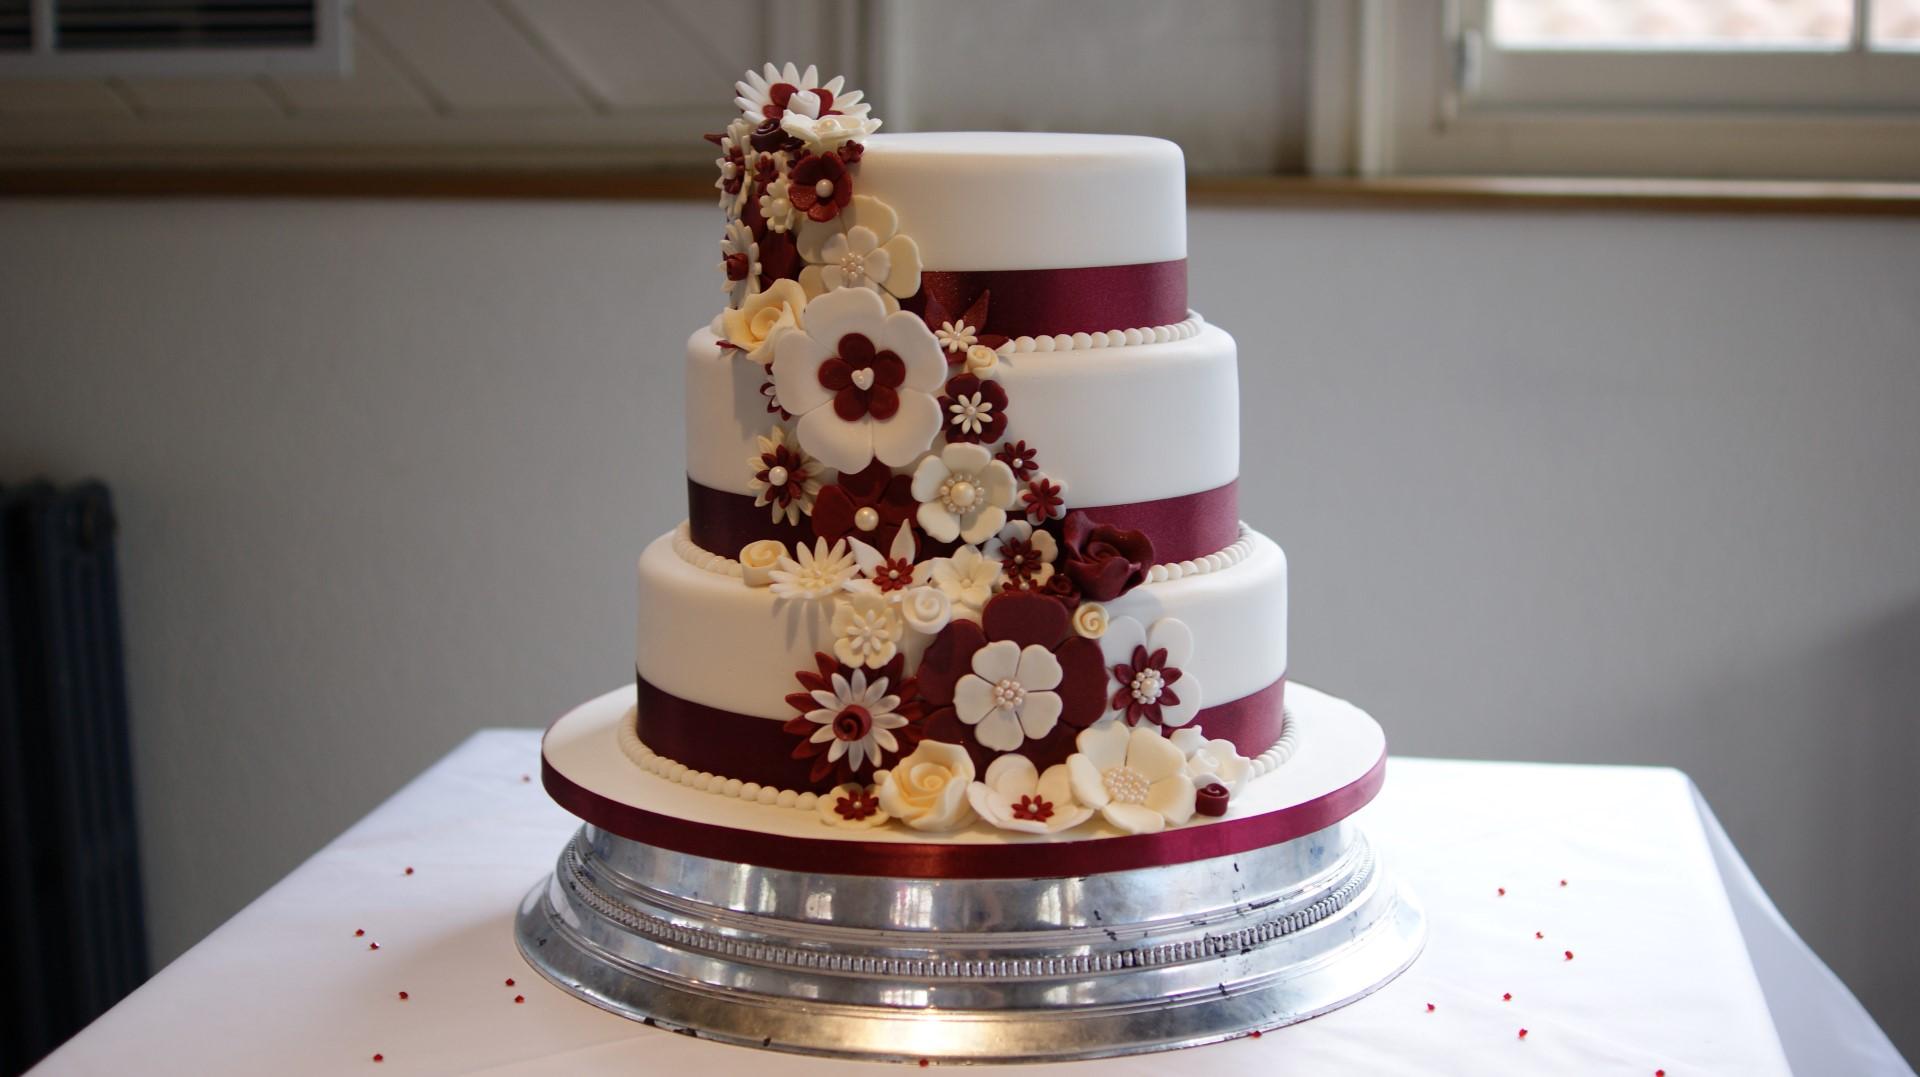 Disney Theme 3 Tier Wedding Cake